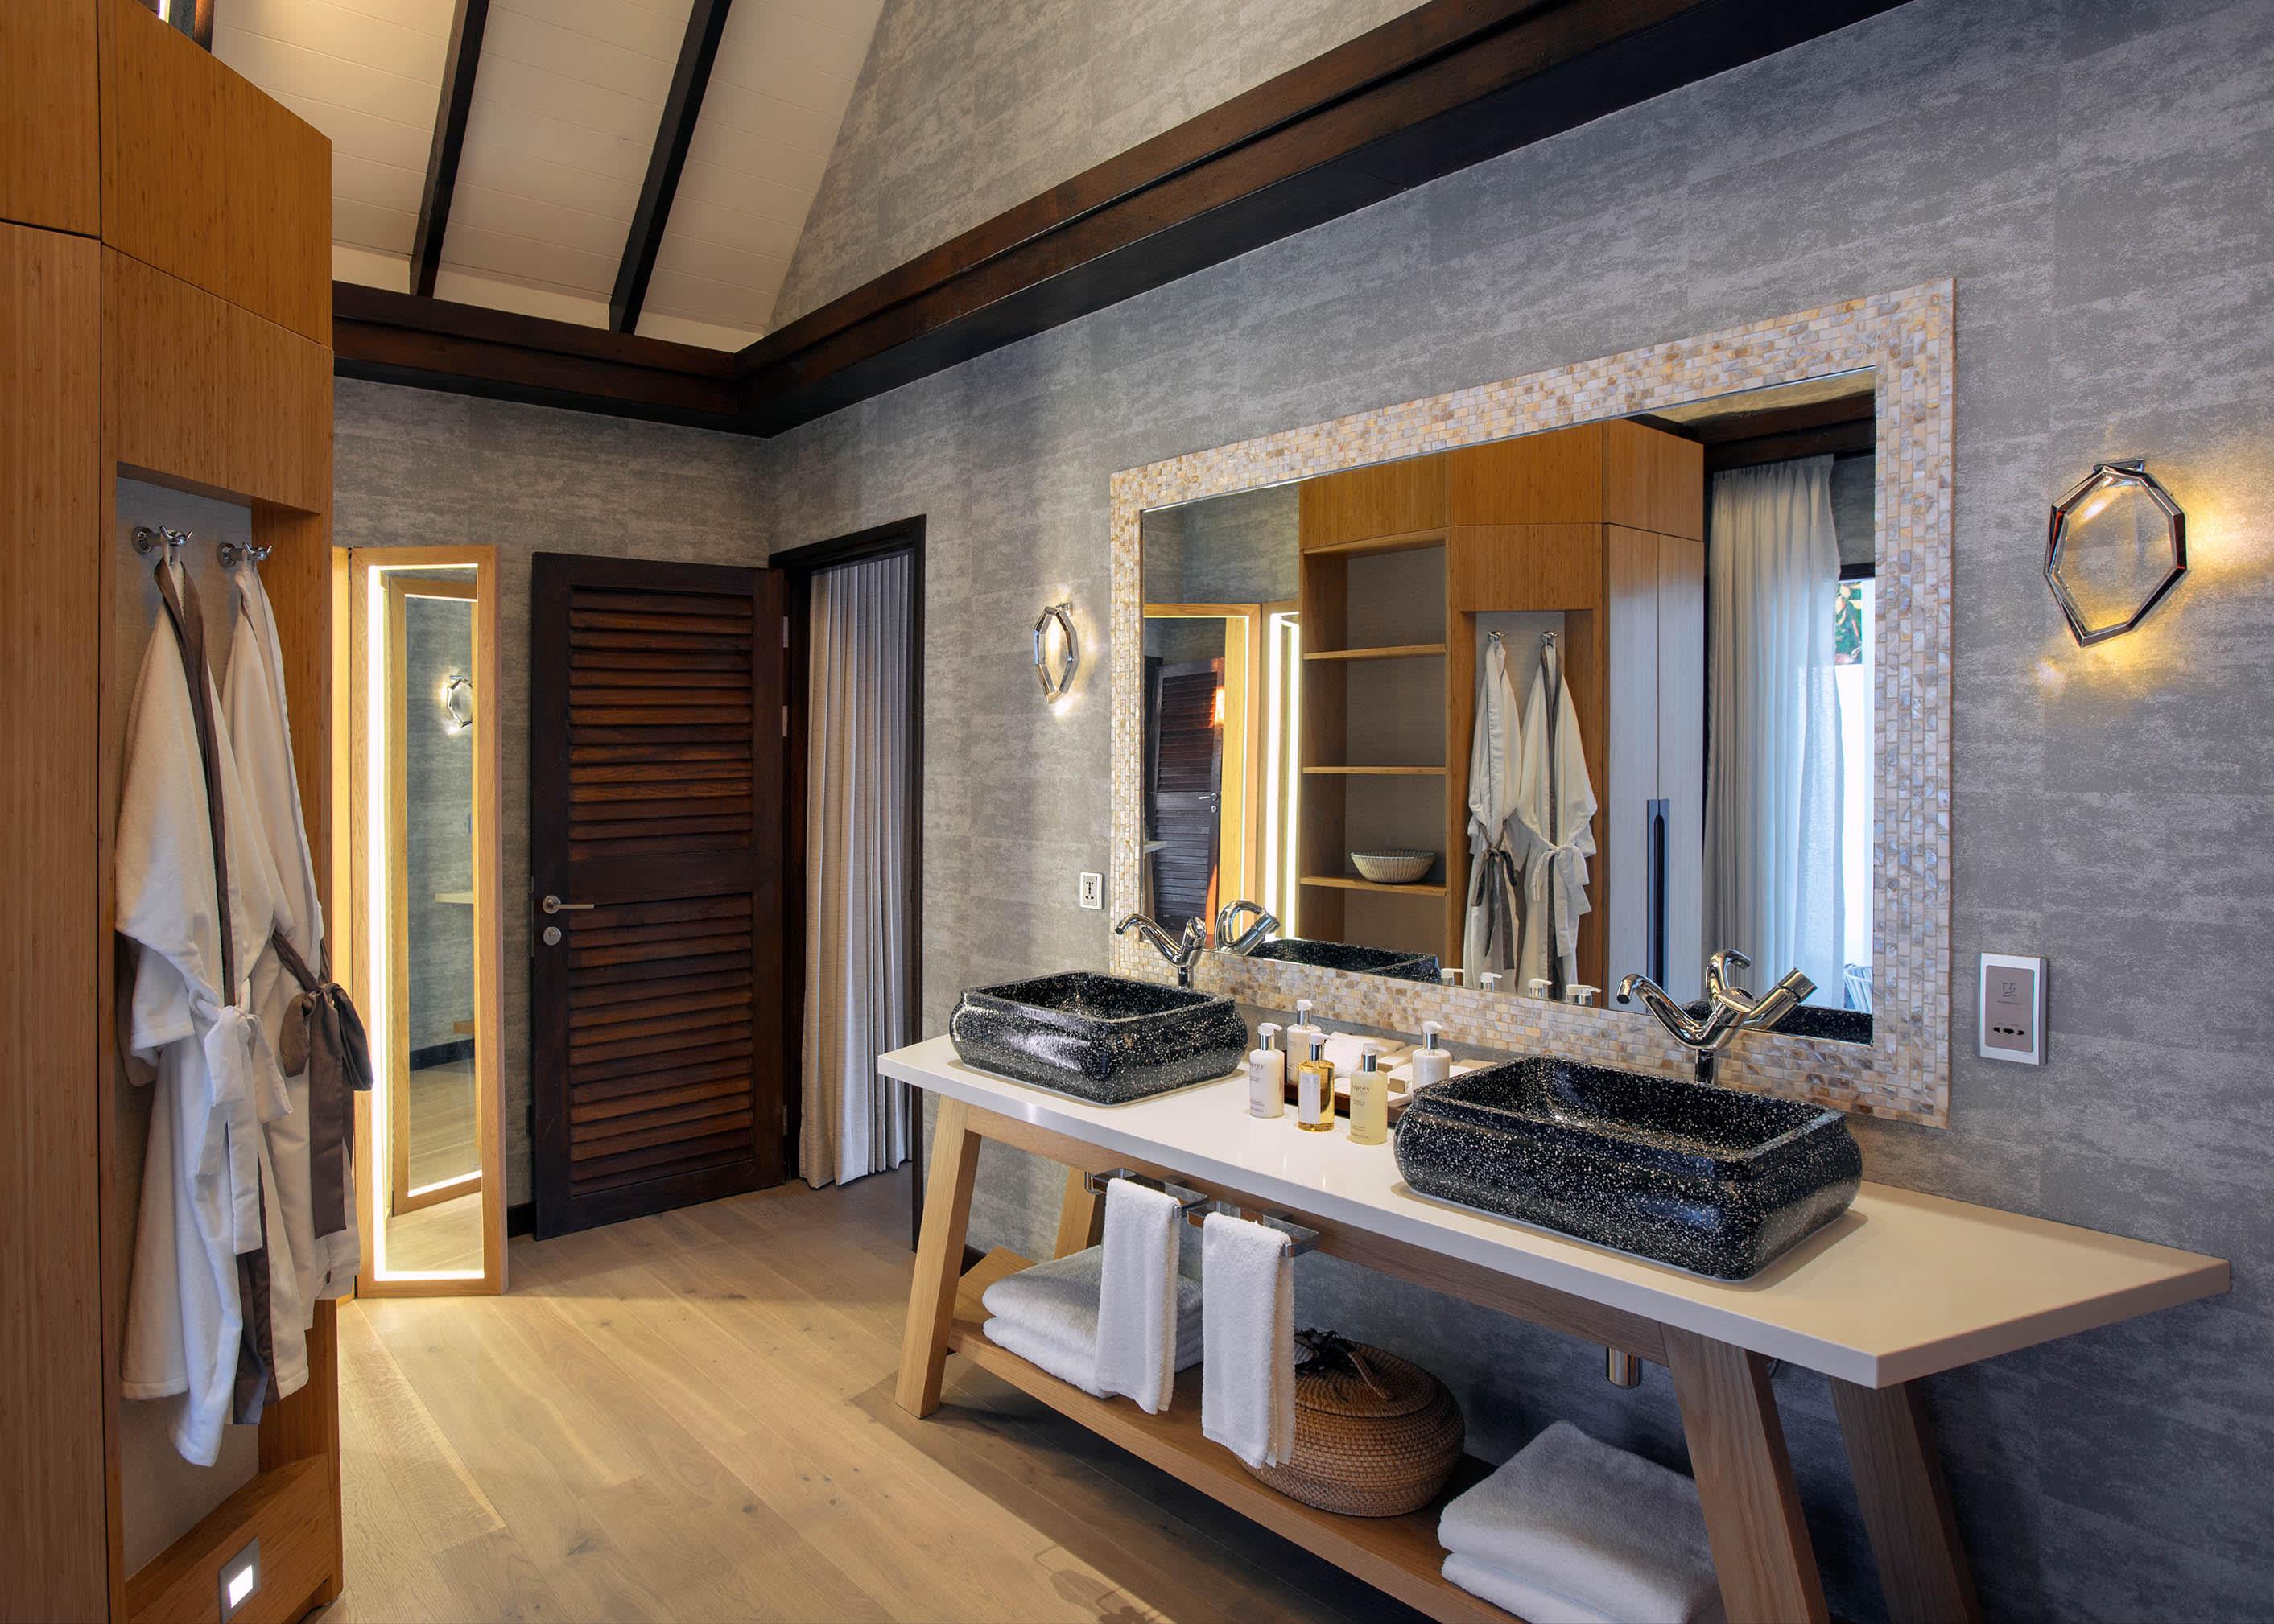 Earth villa bathroom